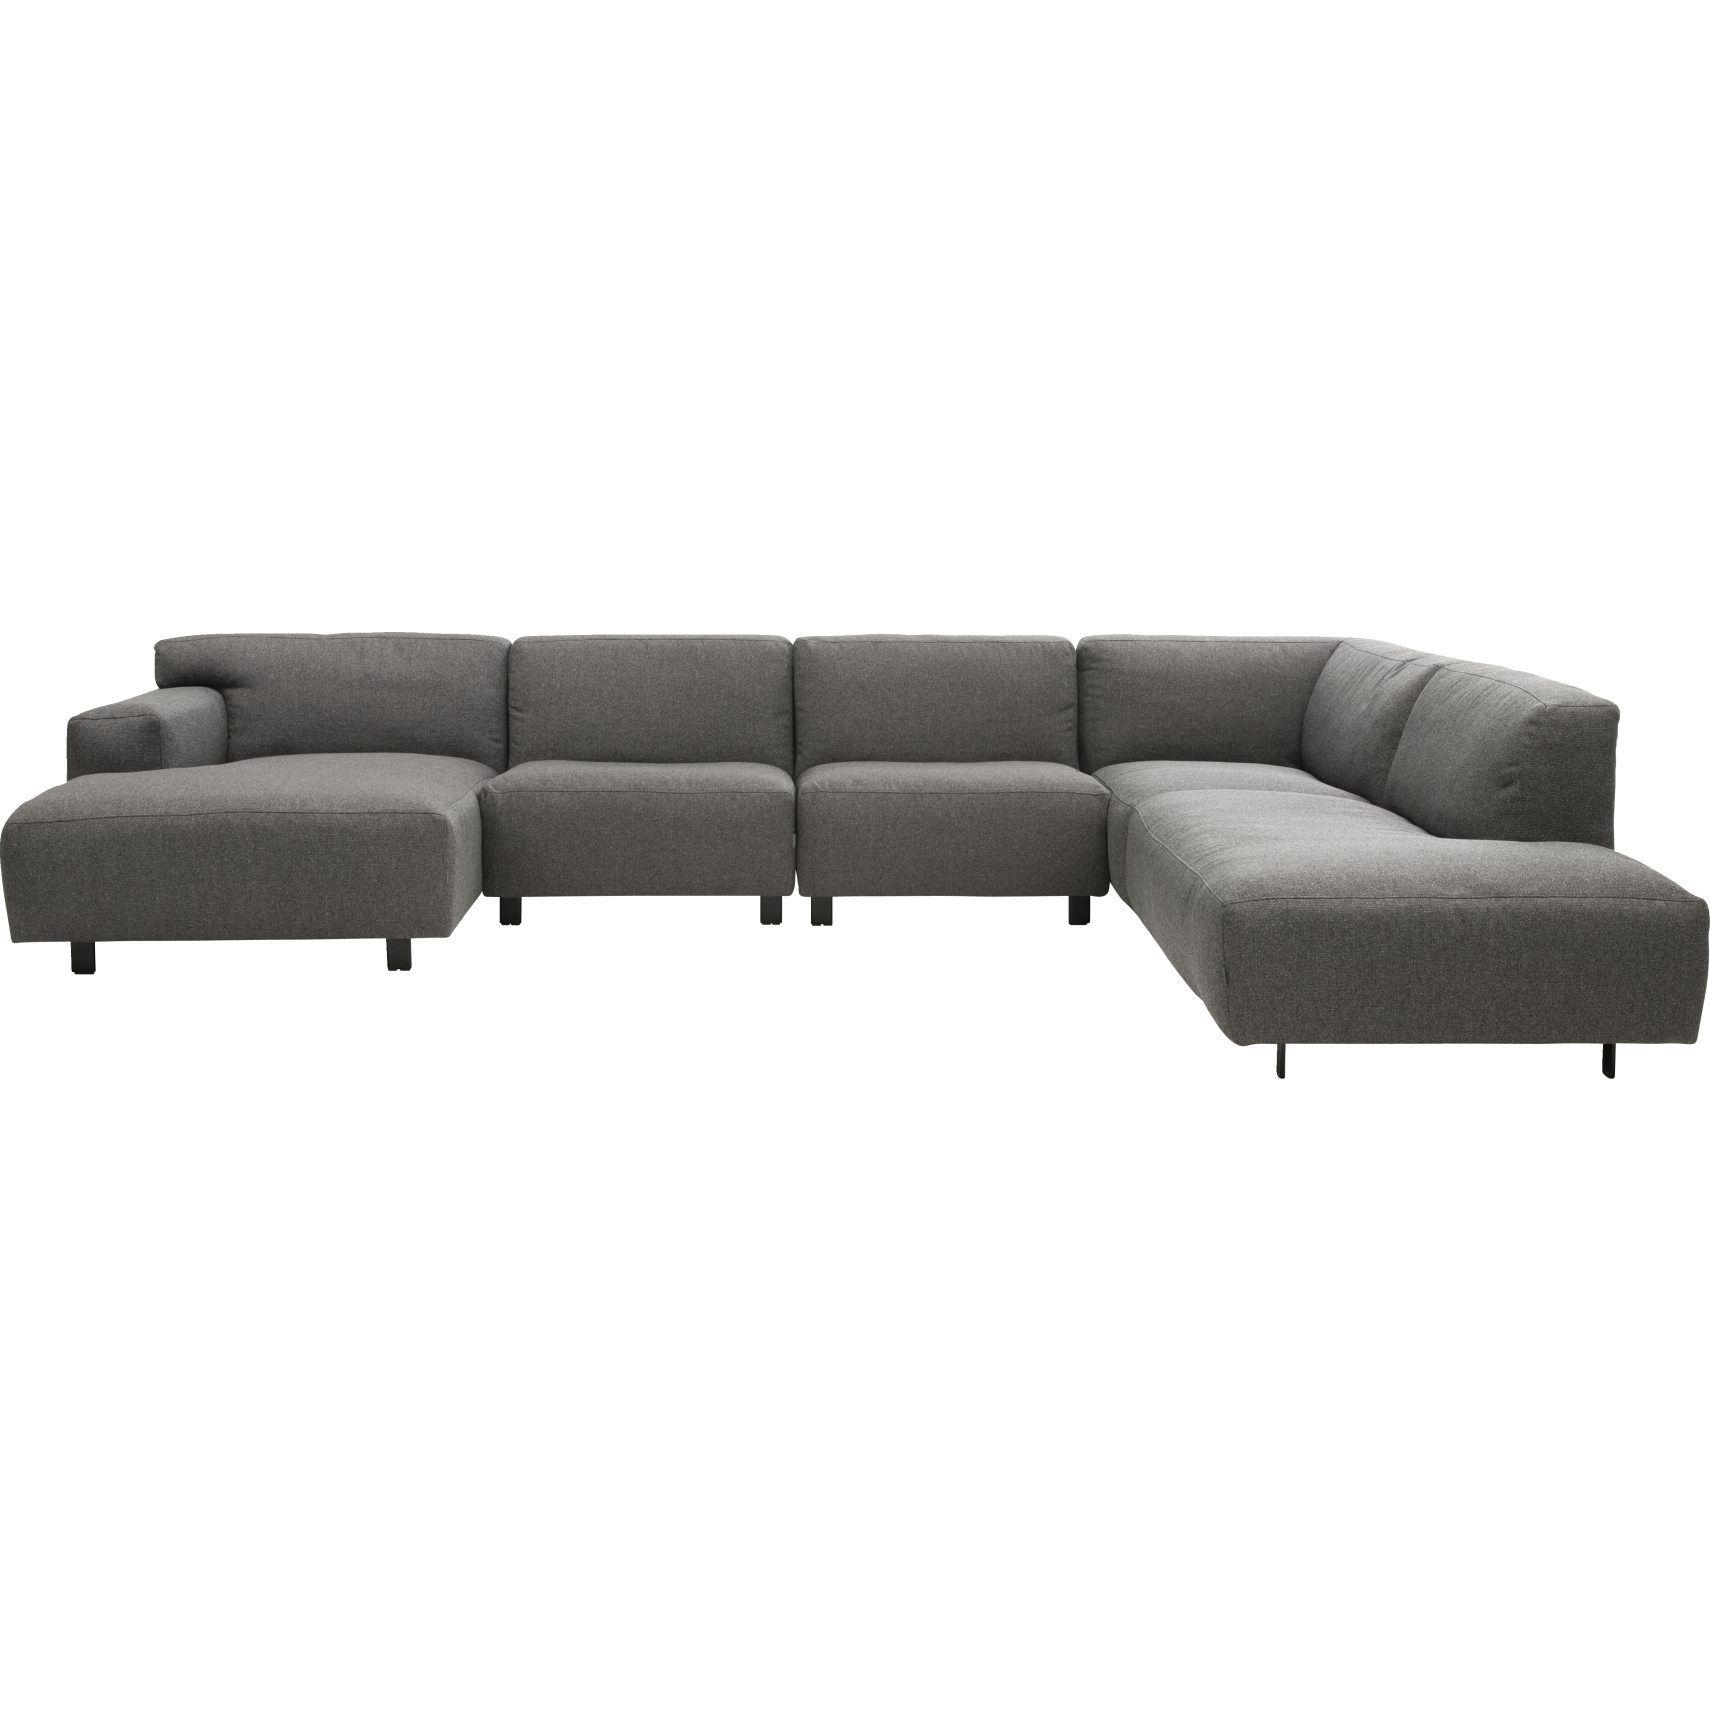 Vesta Corner sofa with socket closure 19 496 25 OFFERS